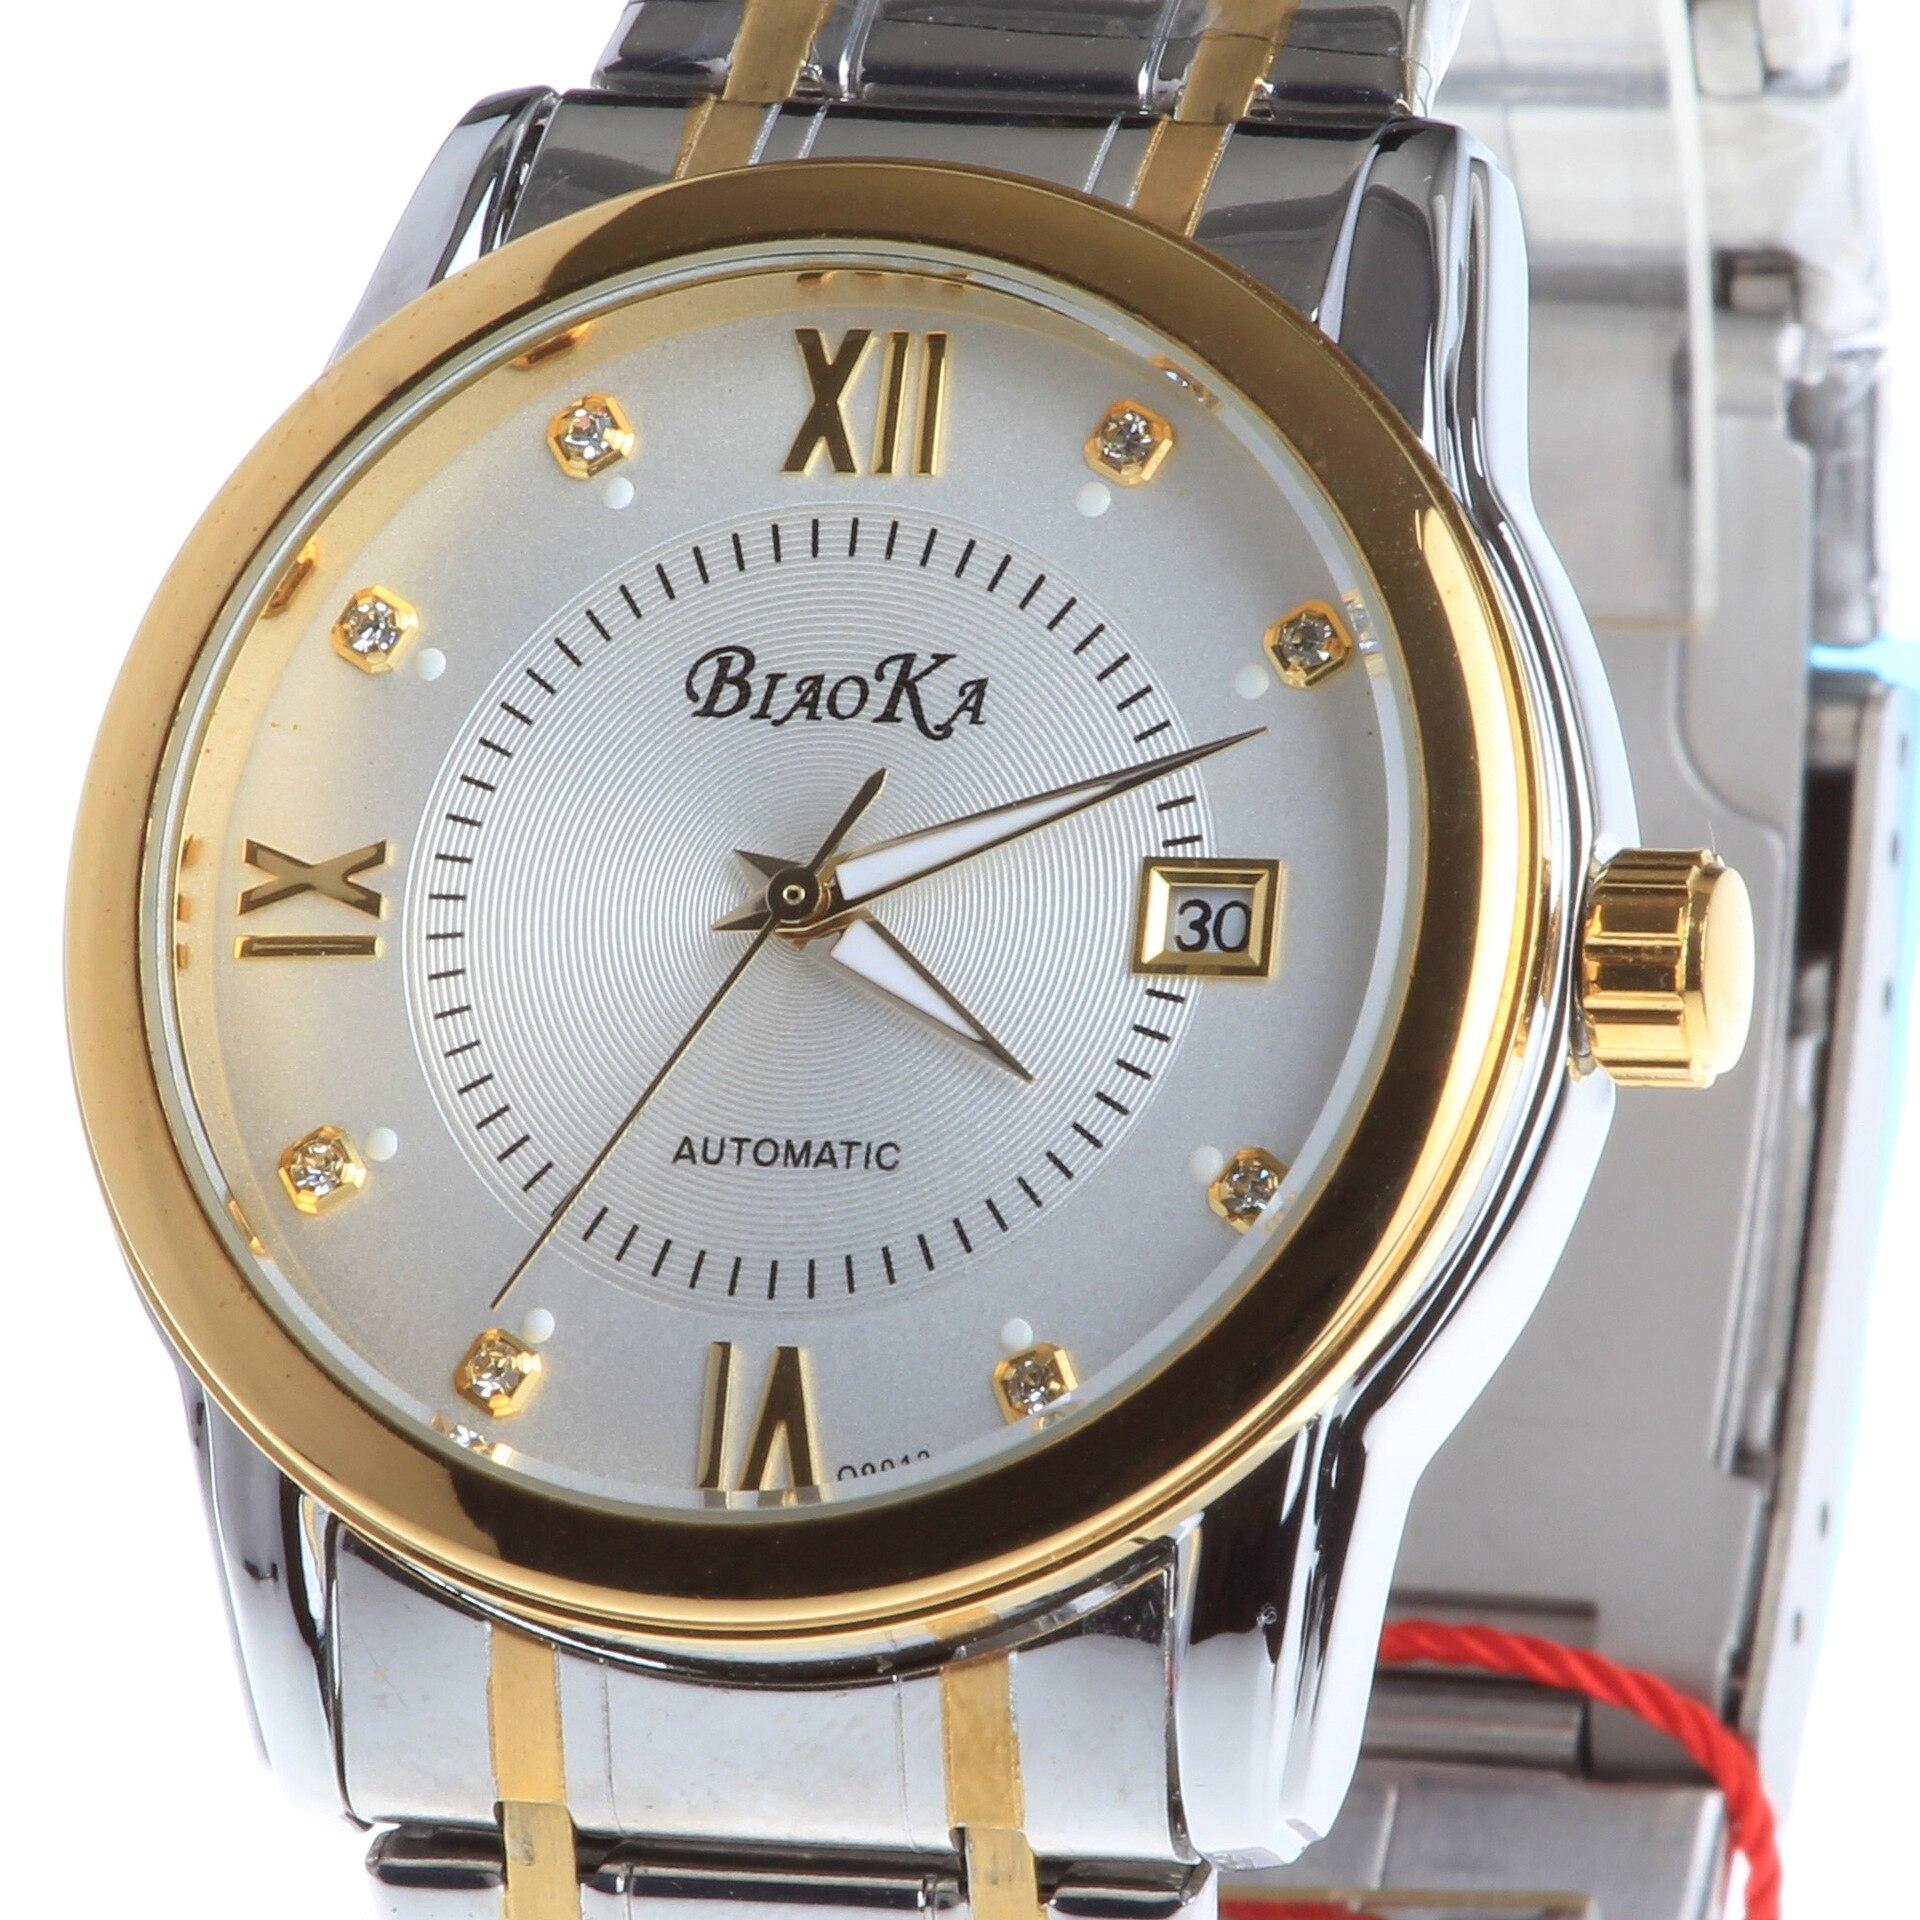 2017 New Arrival Brand BIAOKA Golden watch Mens Waterproof Calendar Rome Automatic Mechanical Watch Men Wristwatches Clock Male<br>